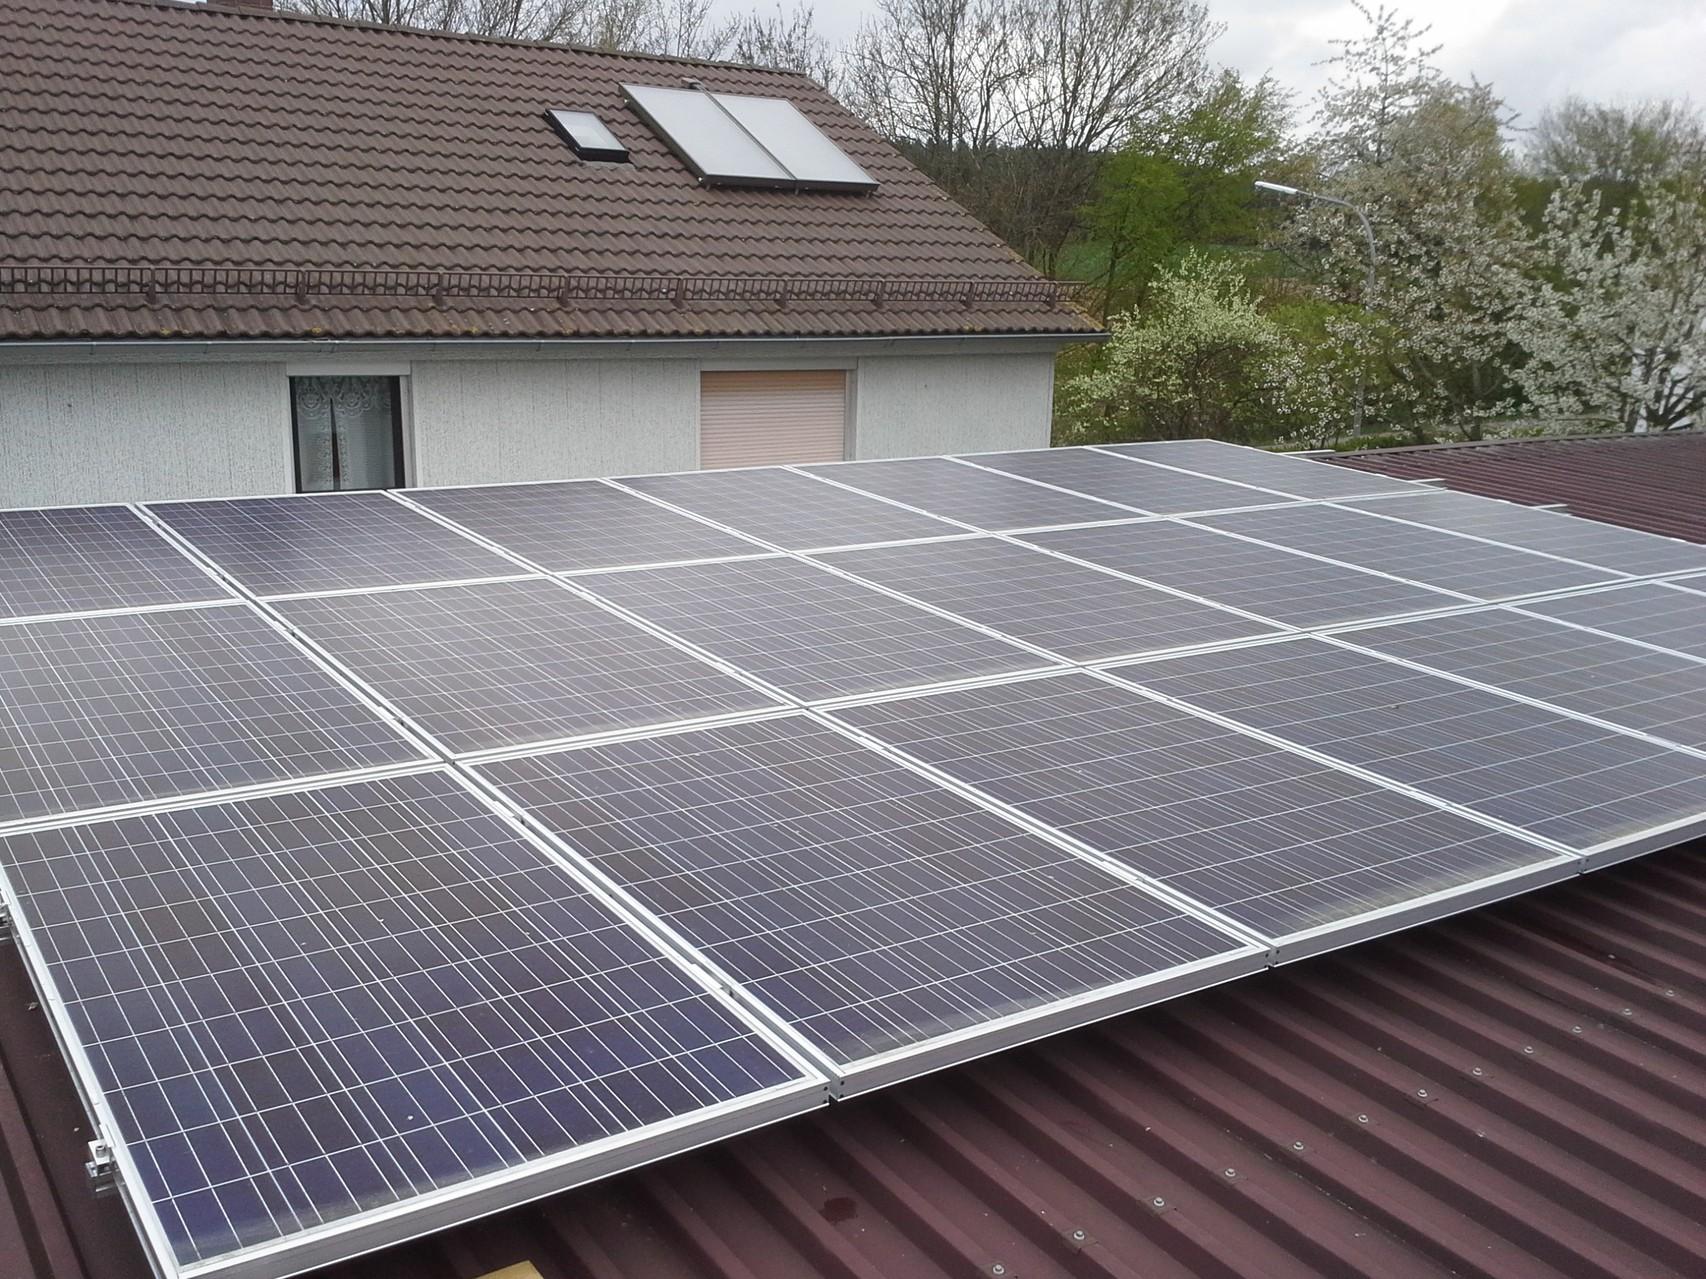 9,5 kWp in 93138 Lappersdorf/Schwaighausen SHARP Solar